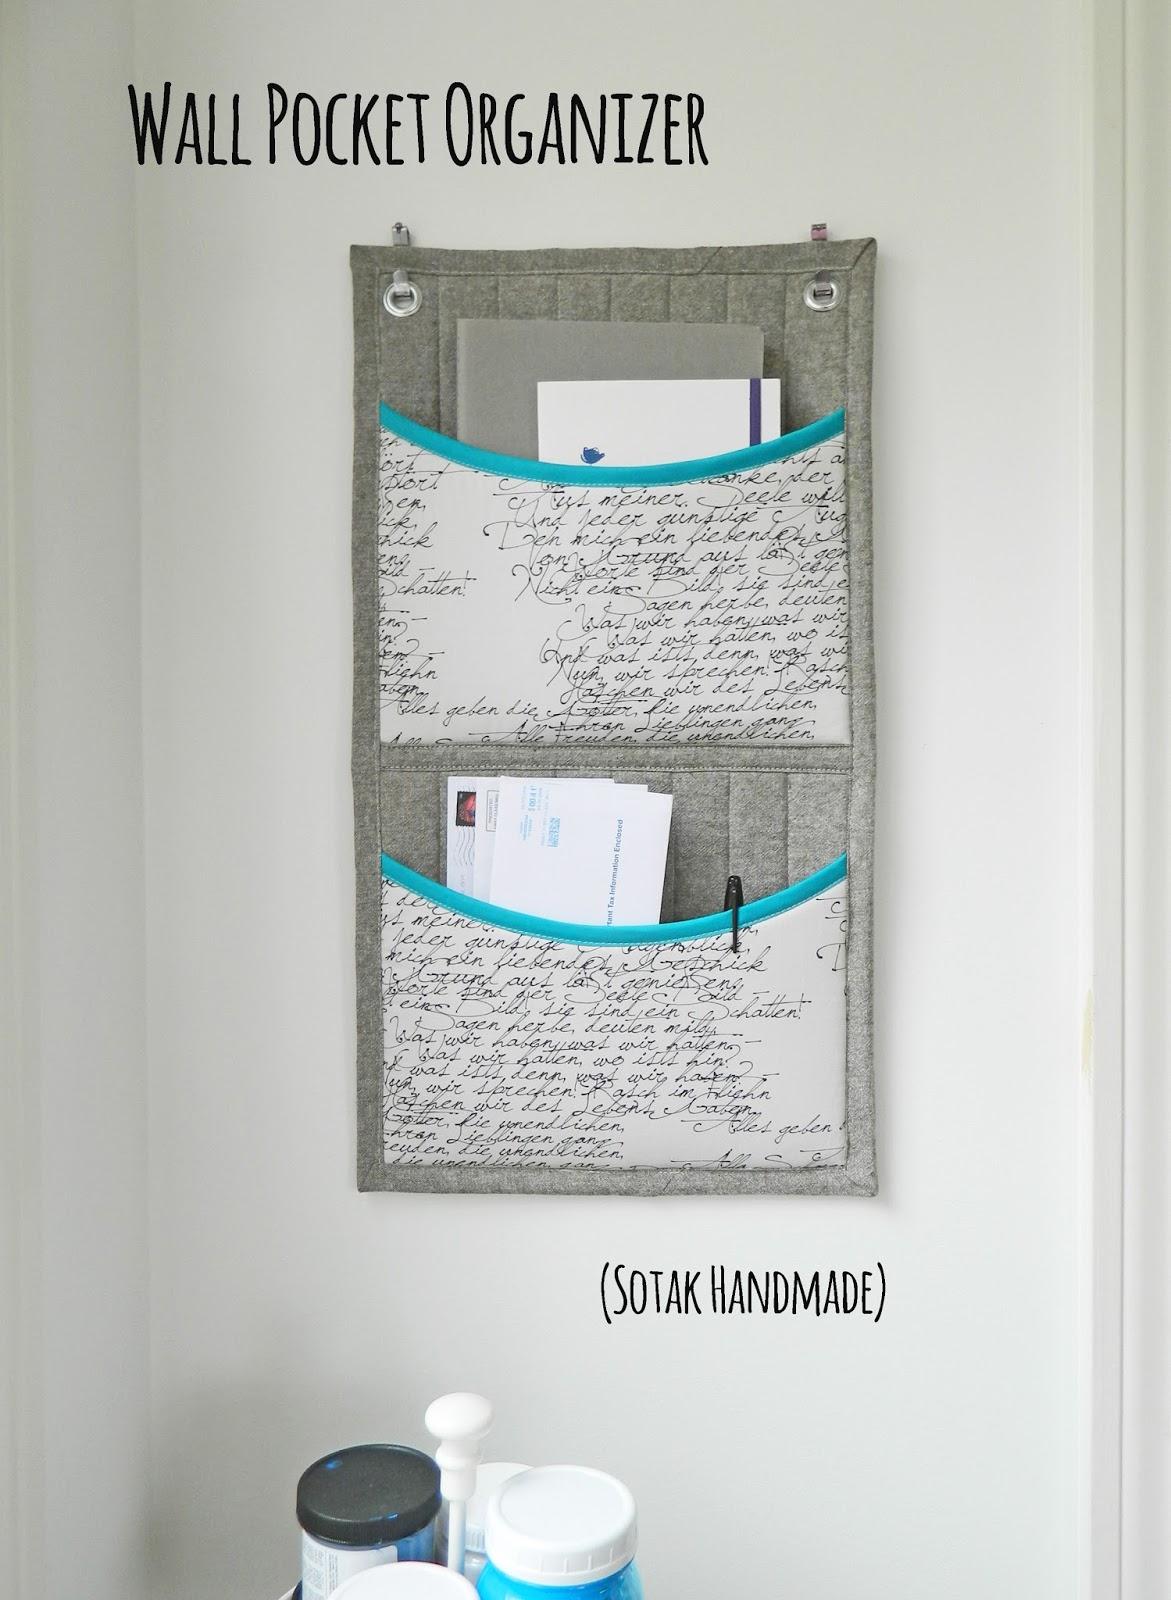 Wall Pocket Organiser FREE sewing pattern